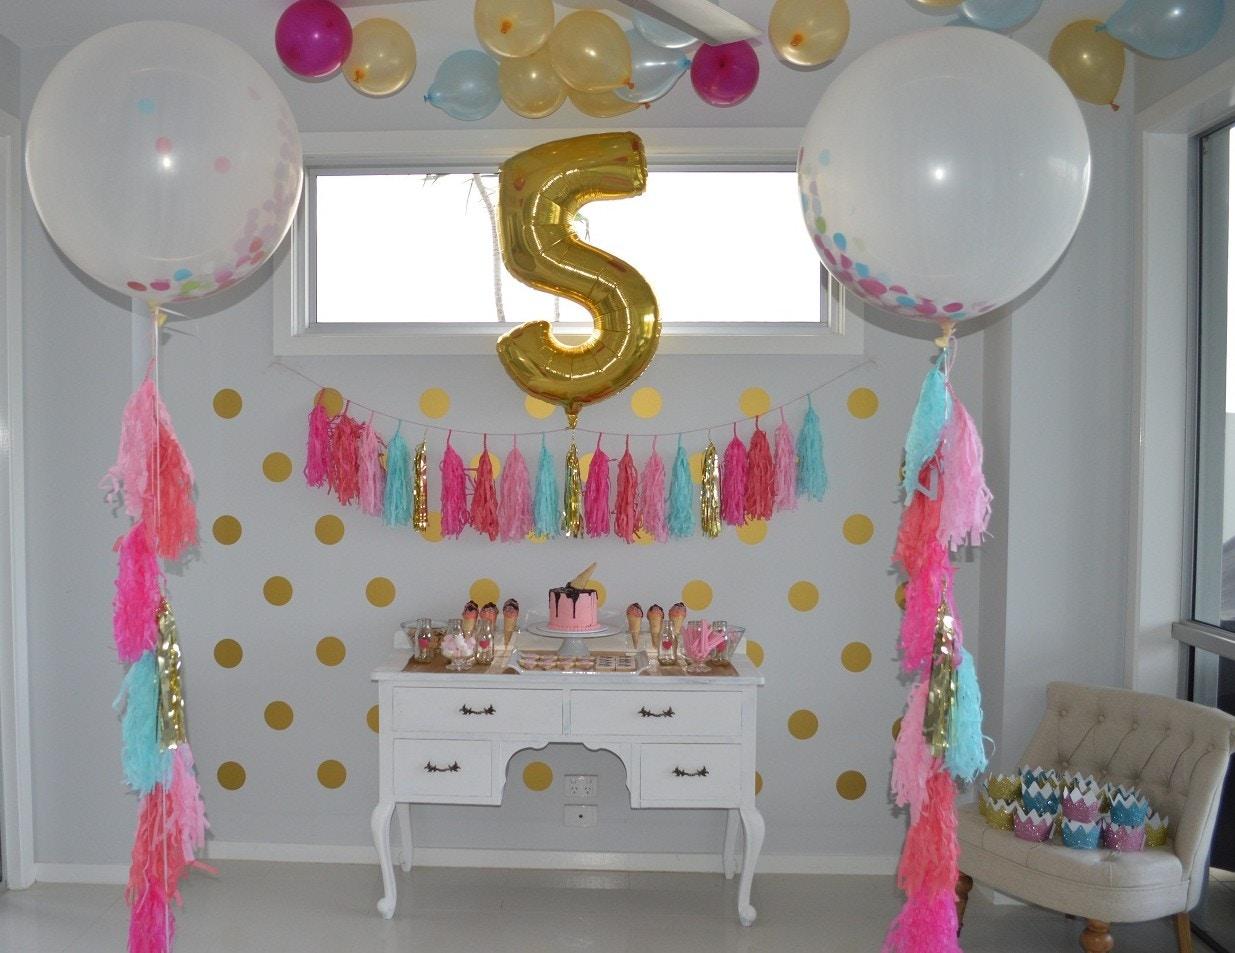 MIA'S 'STYLISH' 5TH BIRTHDAY